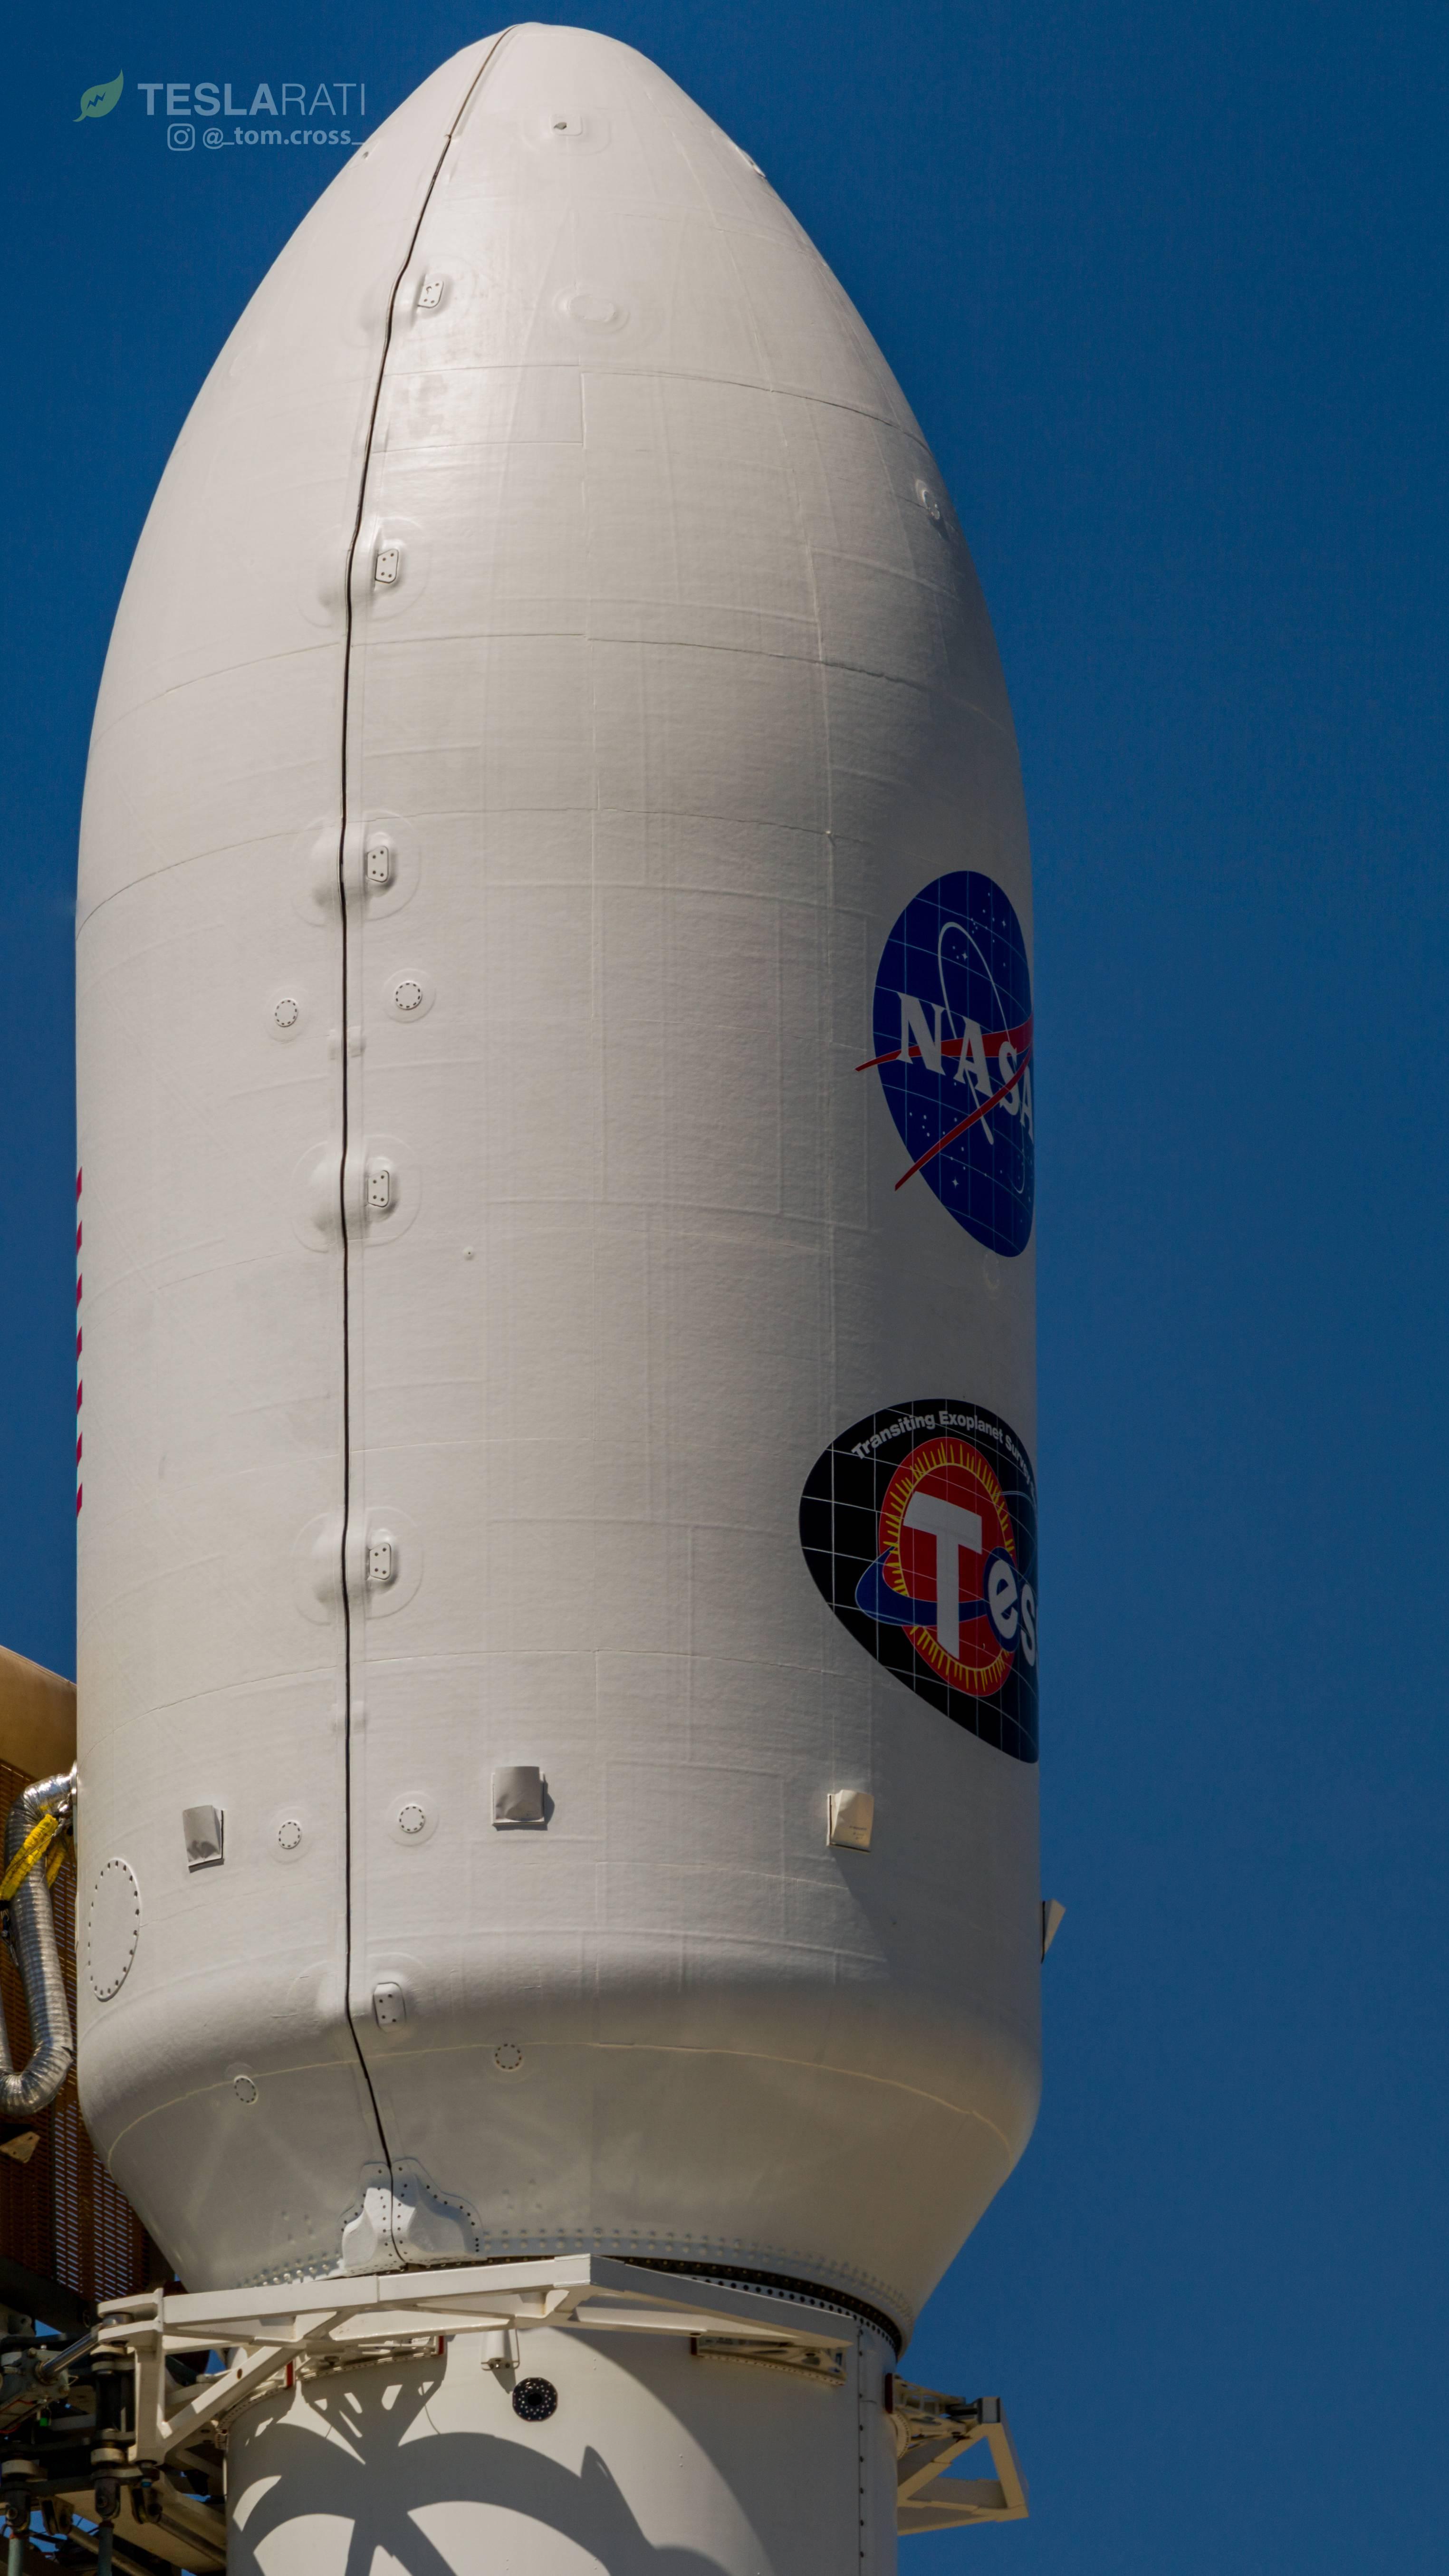 Falcon 9 1045 Tess Fairing Details Tom Cross C Teslarati